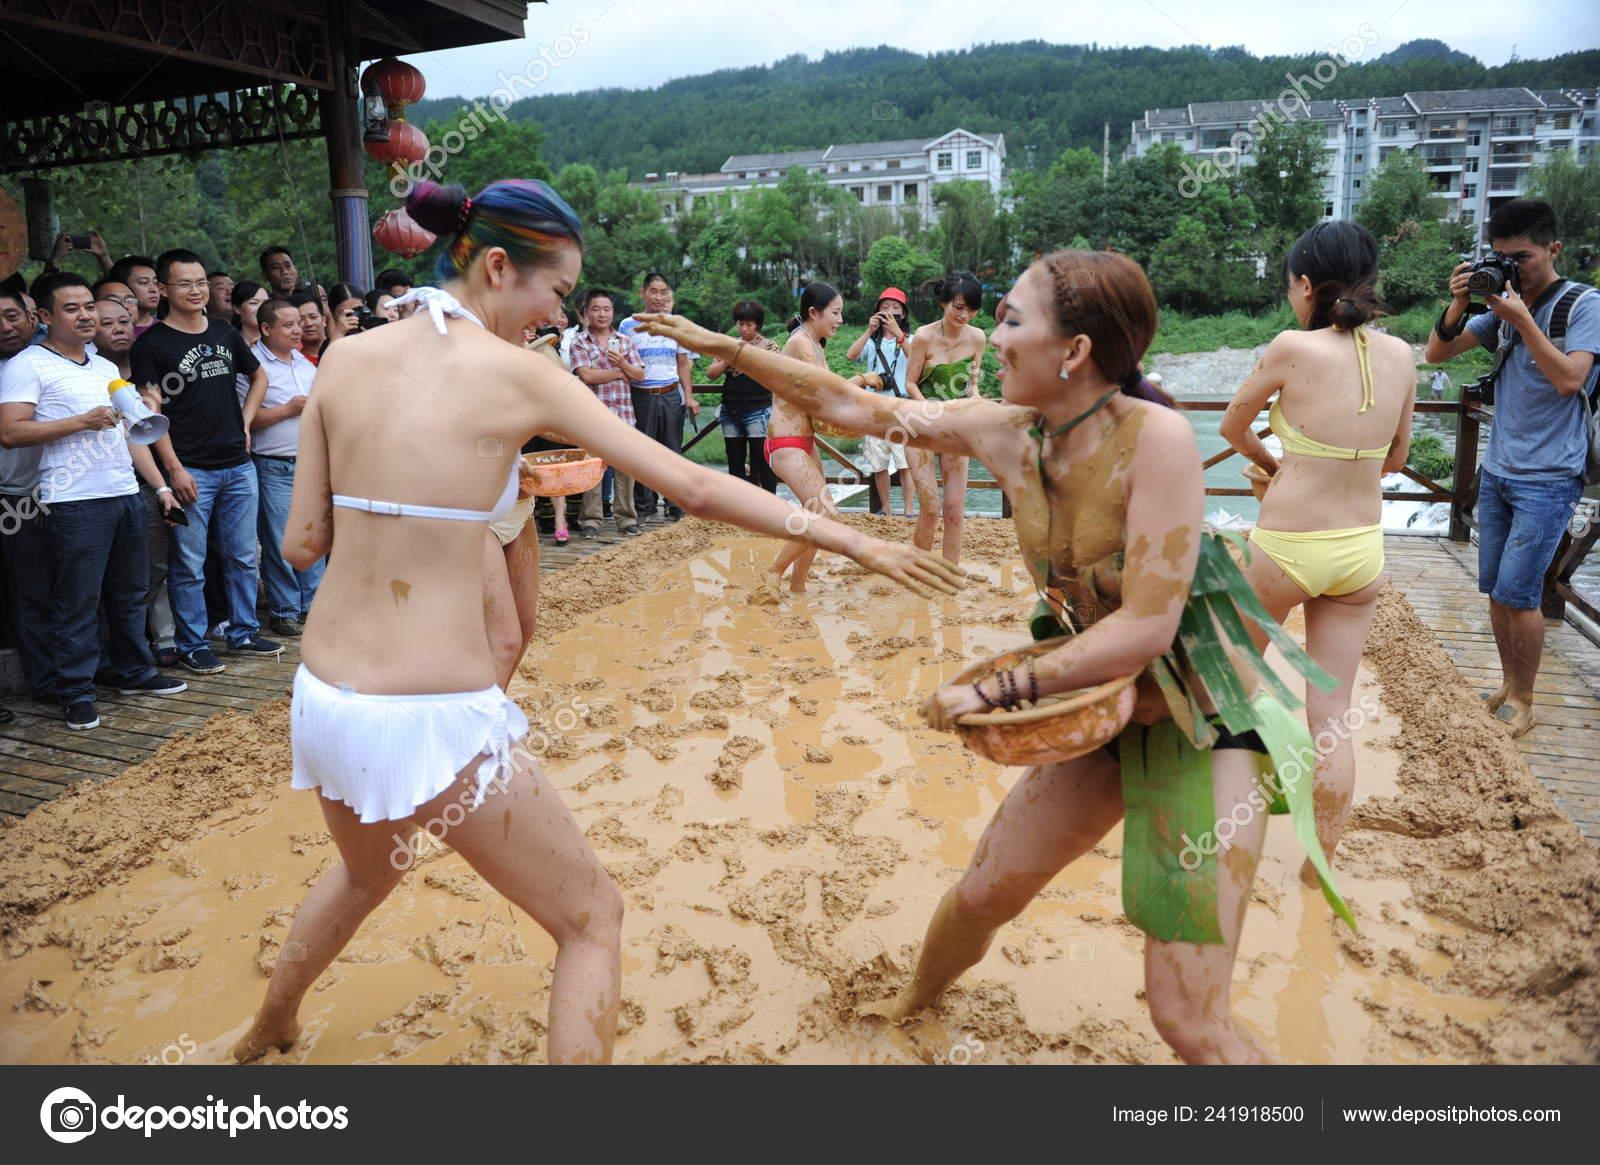 Bikini pic wrestling Prompt, where